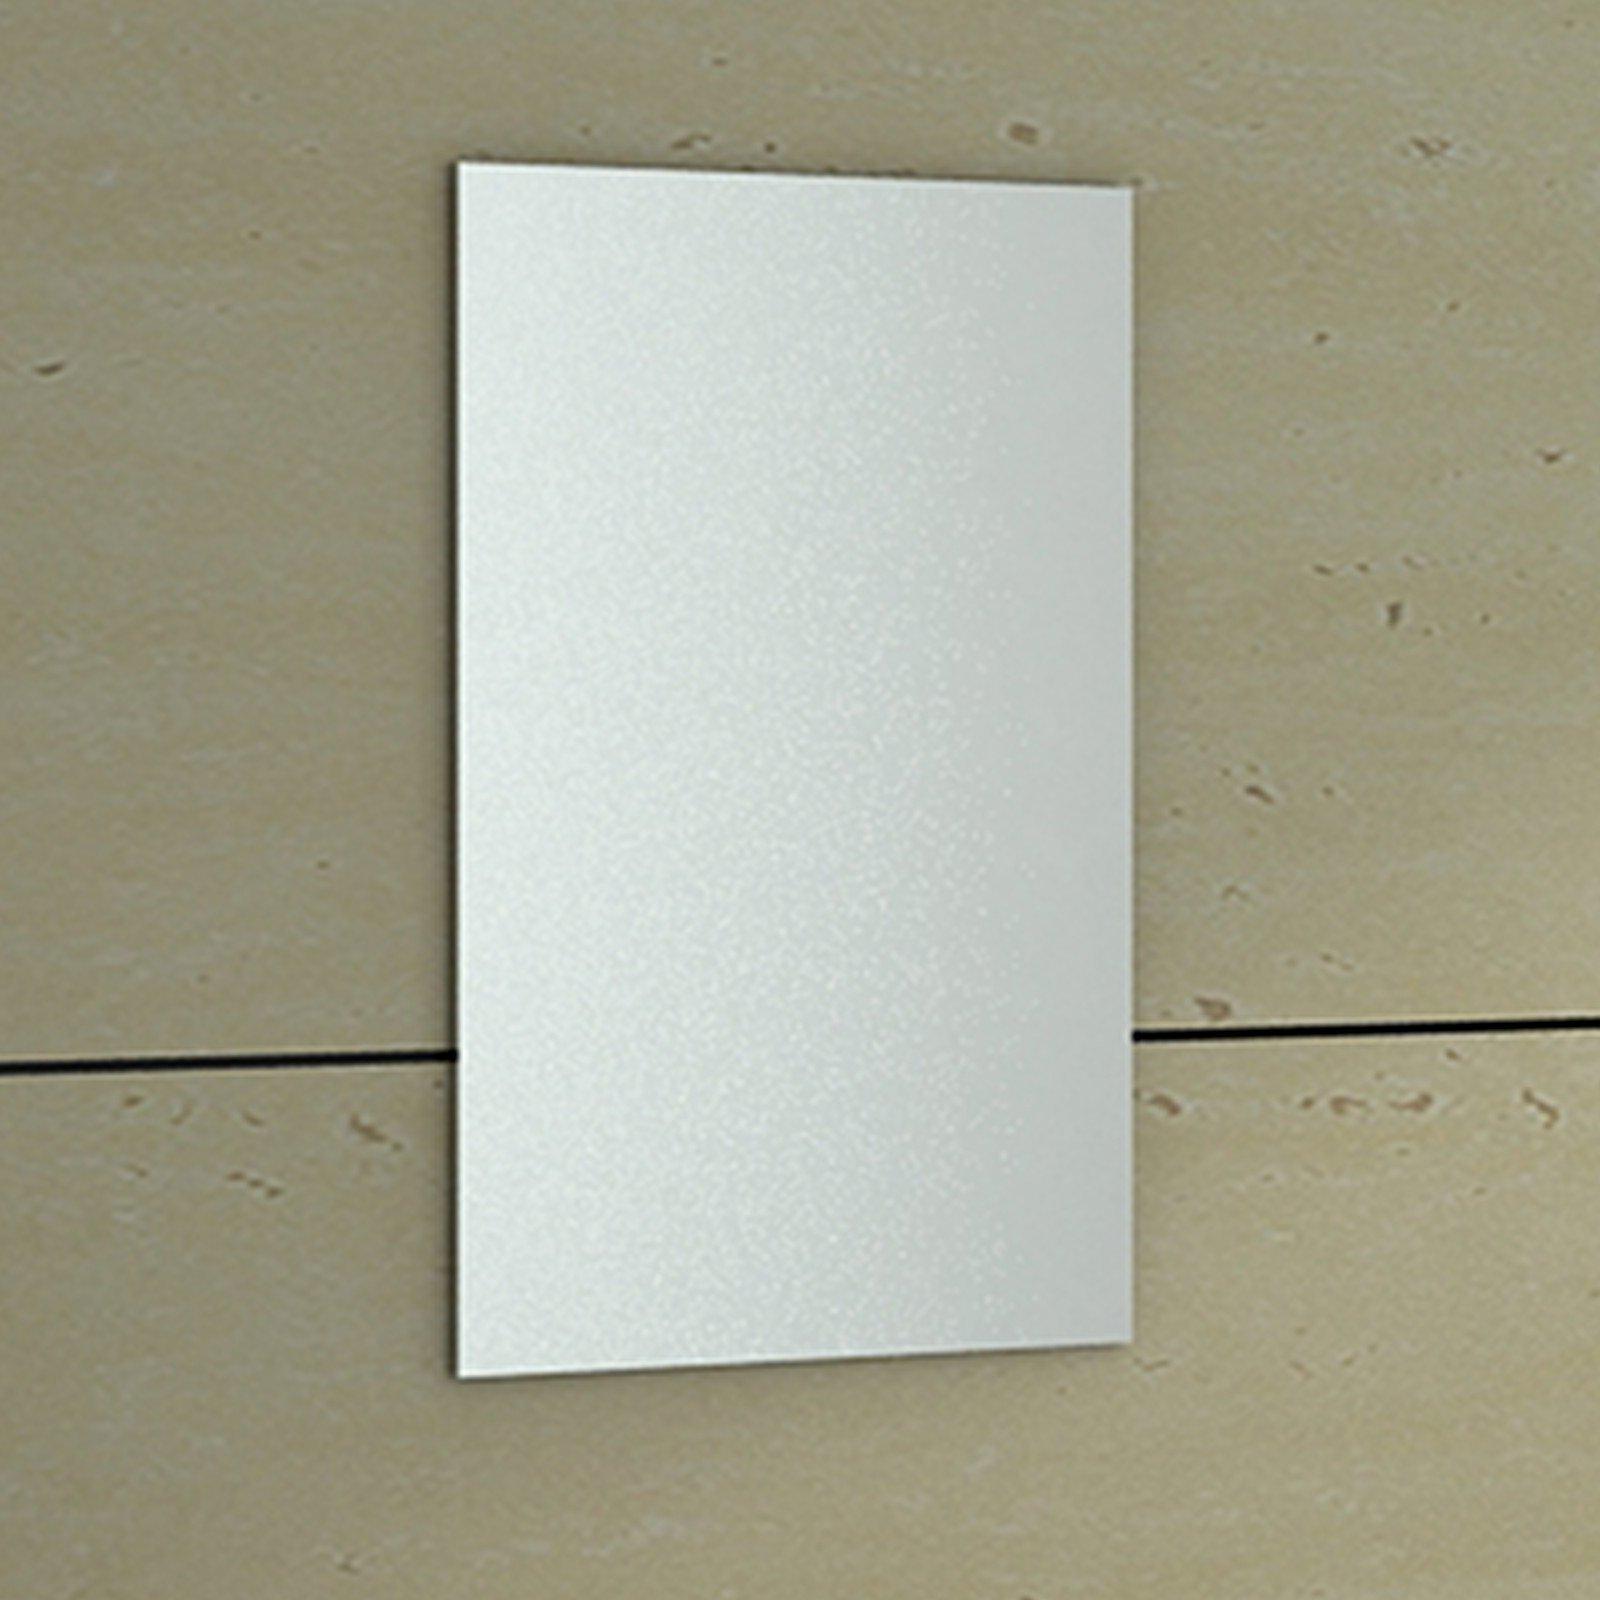 ENKI BM004 500 x 700 mm Rectangular Horizon Bathroom Wall Mounted Glass Bevelled Frameless Mirror - Mirror